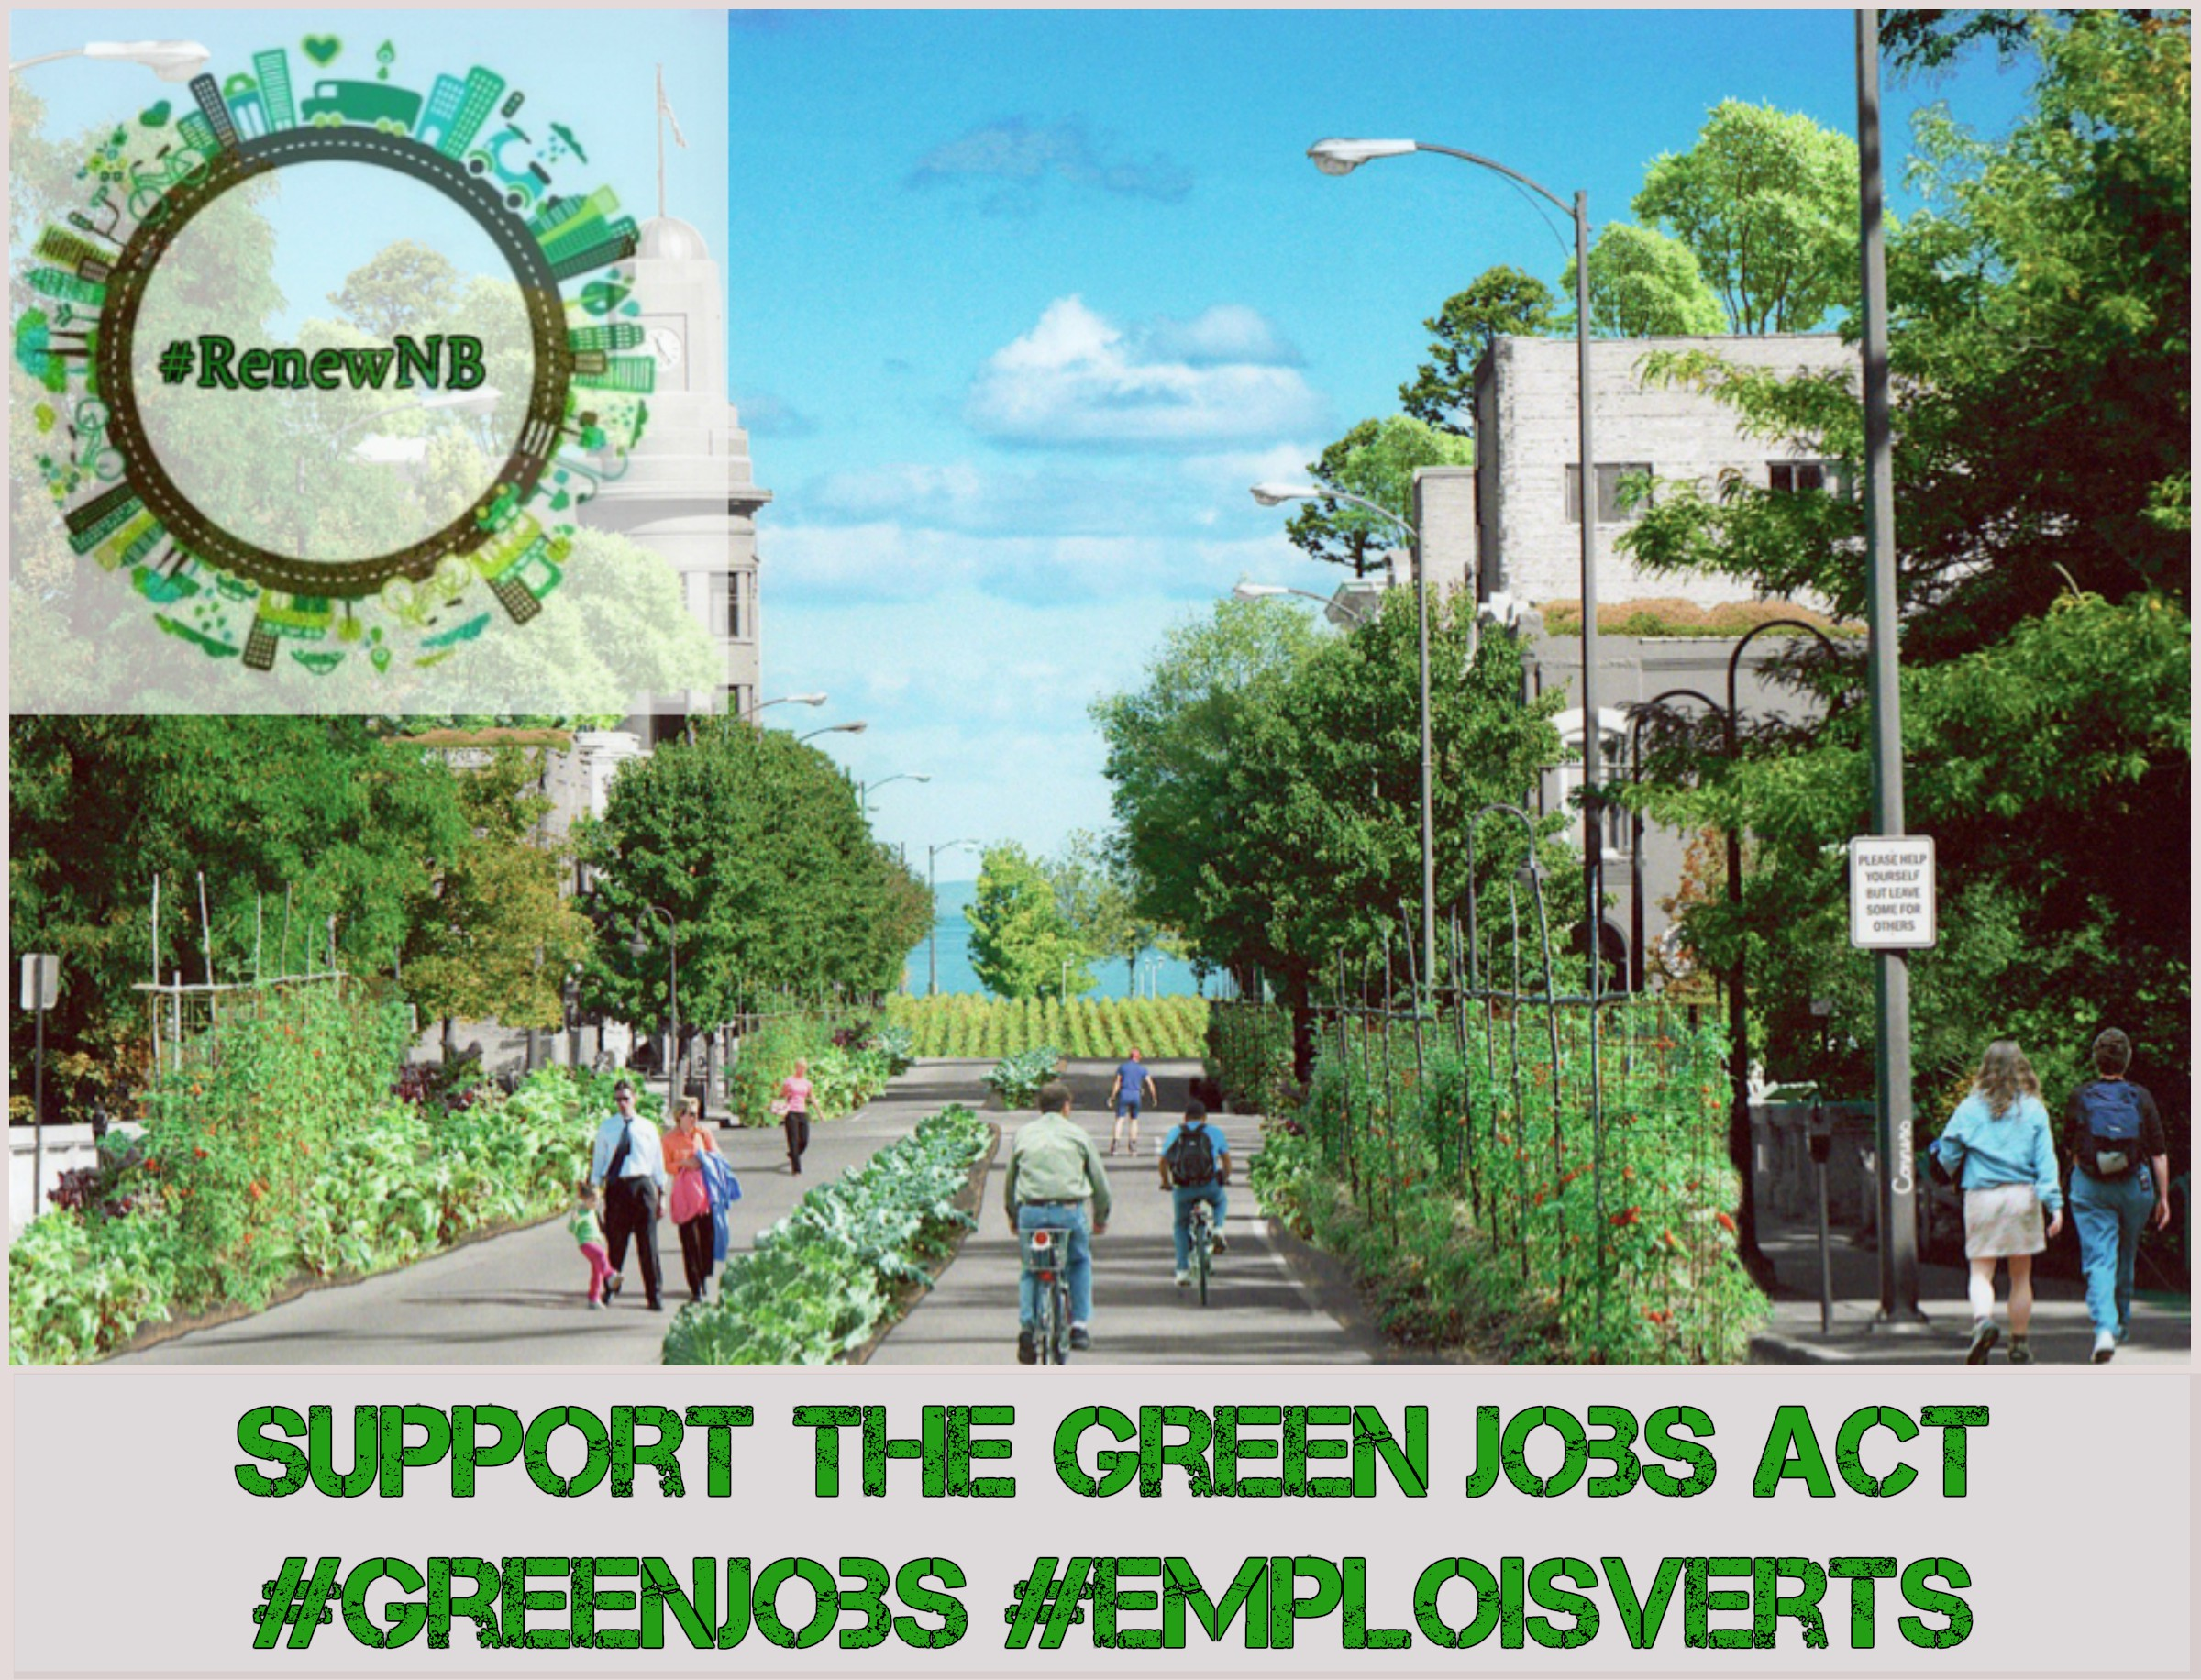 Emplois_vert_greens_BeFunky_Collage.jpg